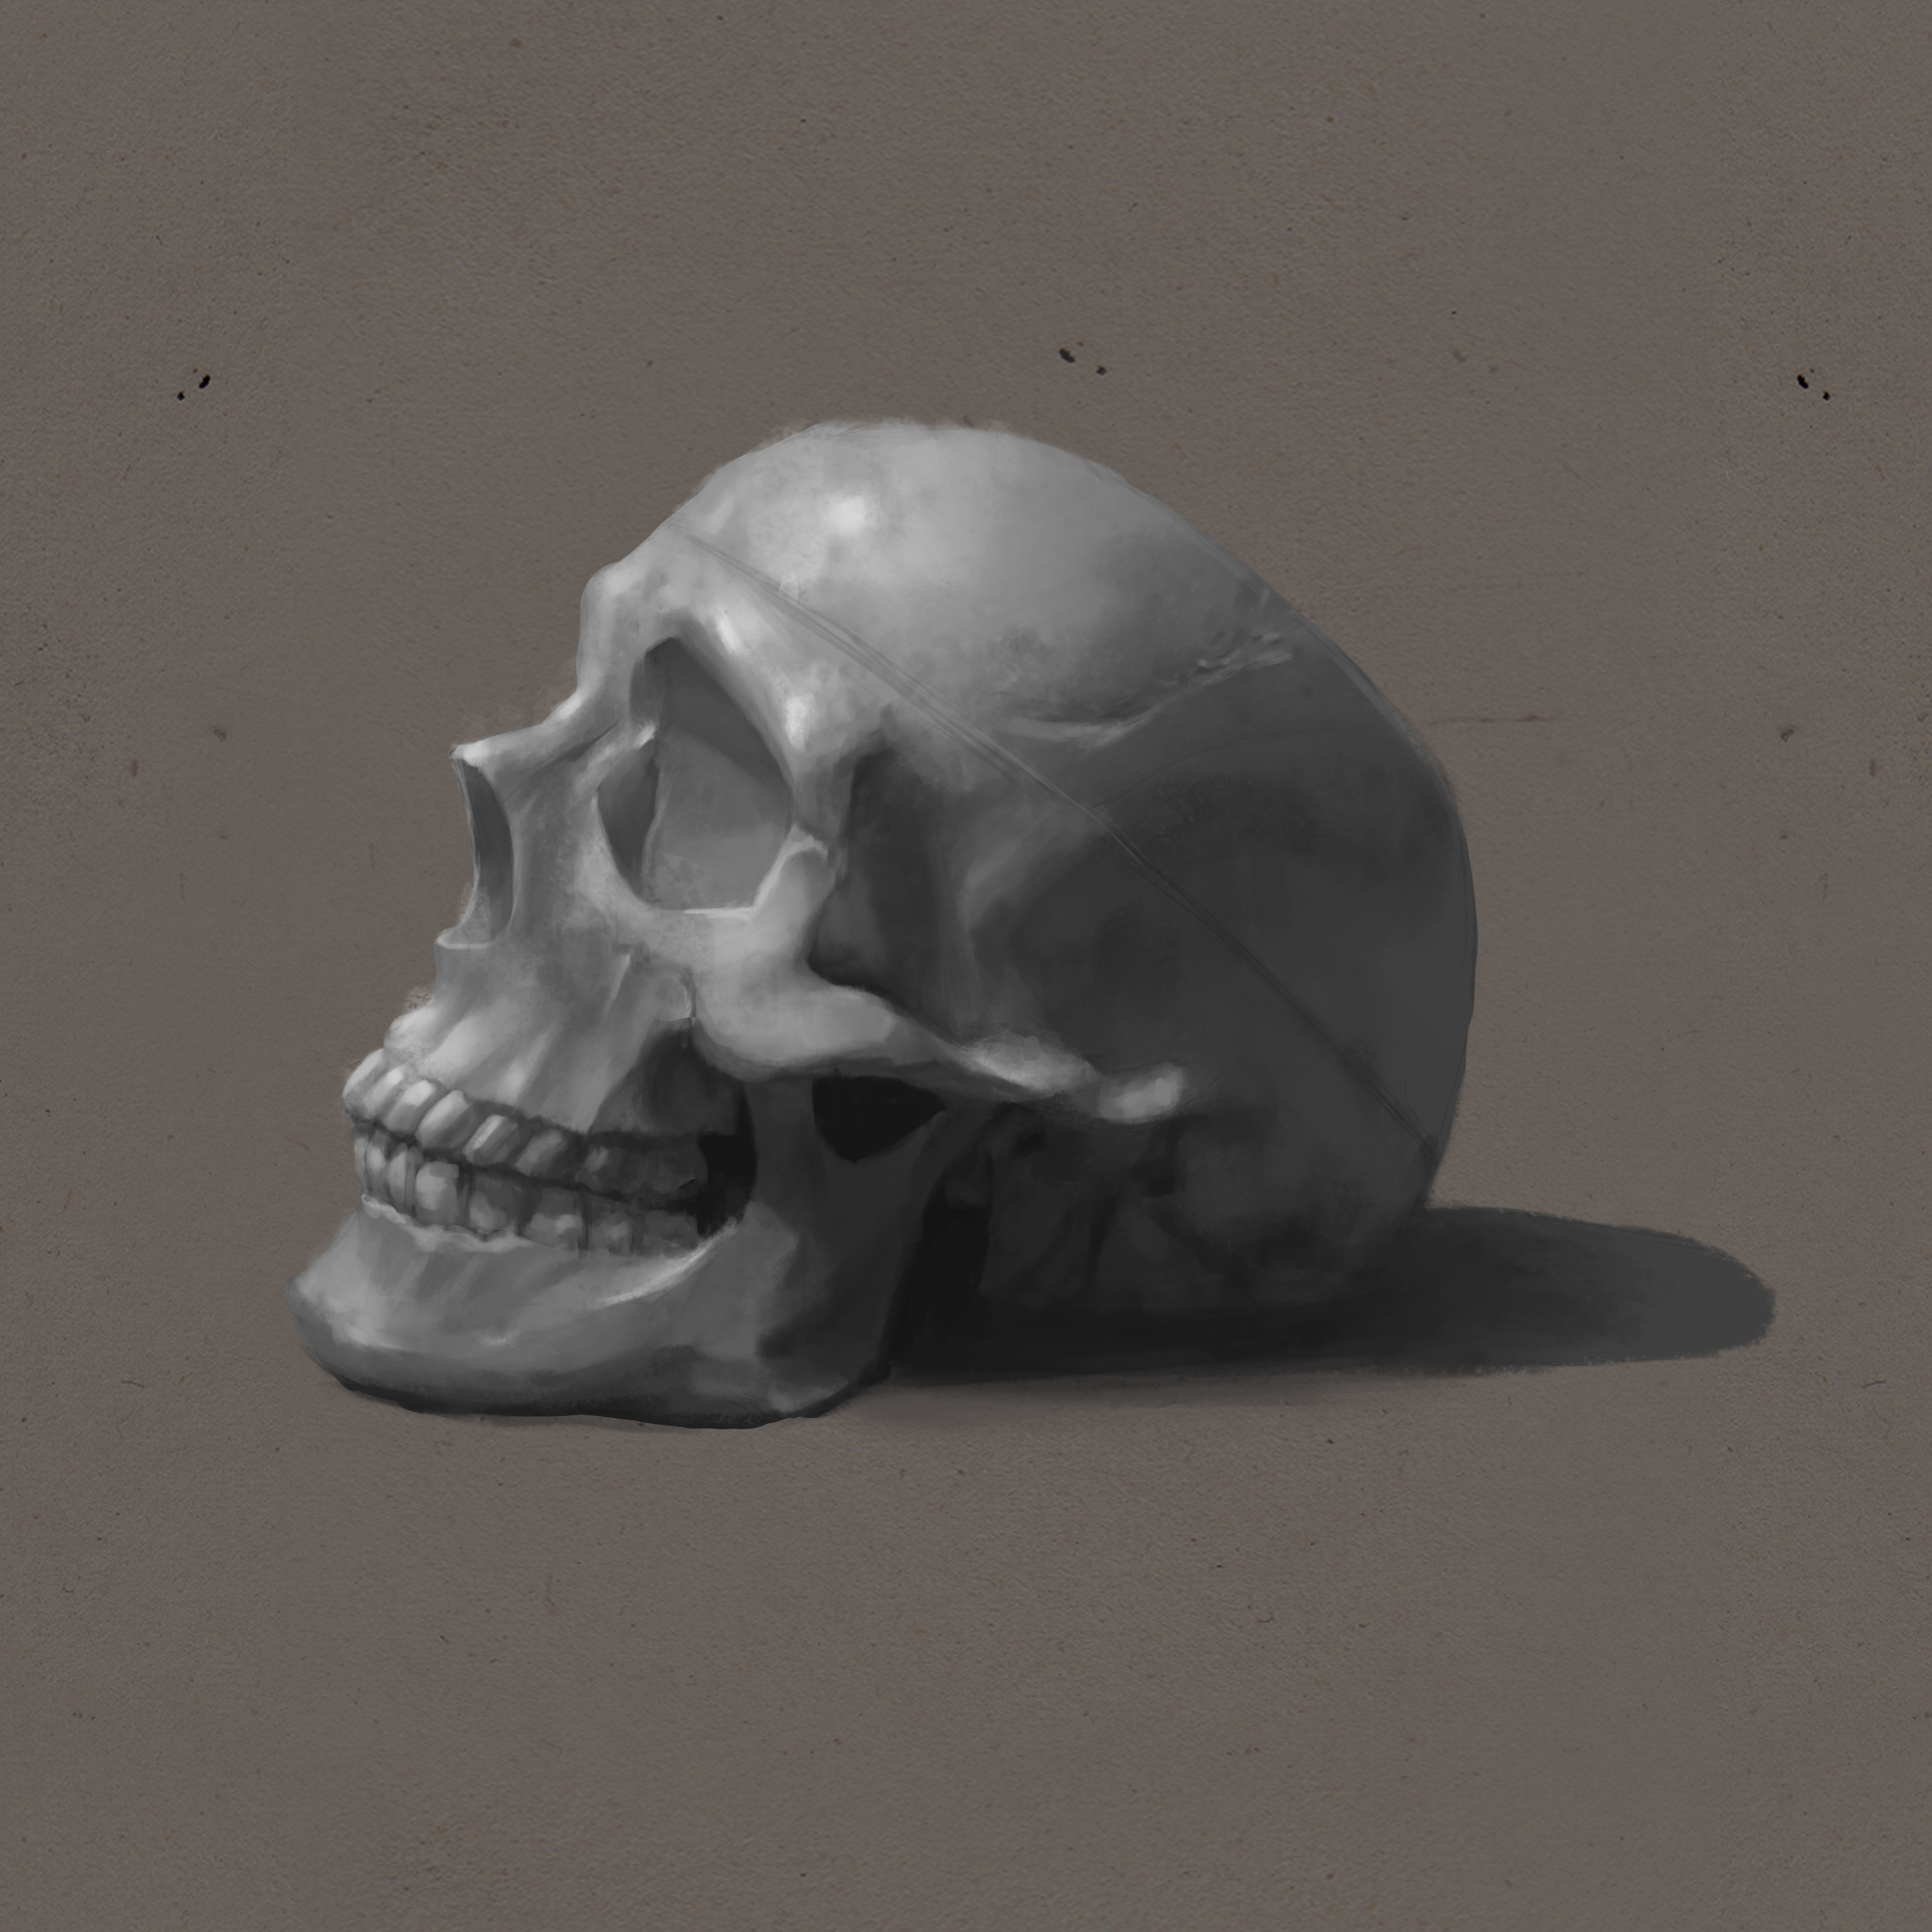 skull_by_bellumwst-d9mbzio.jpg